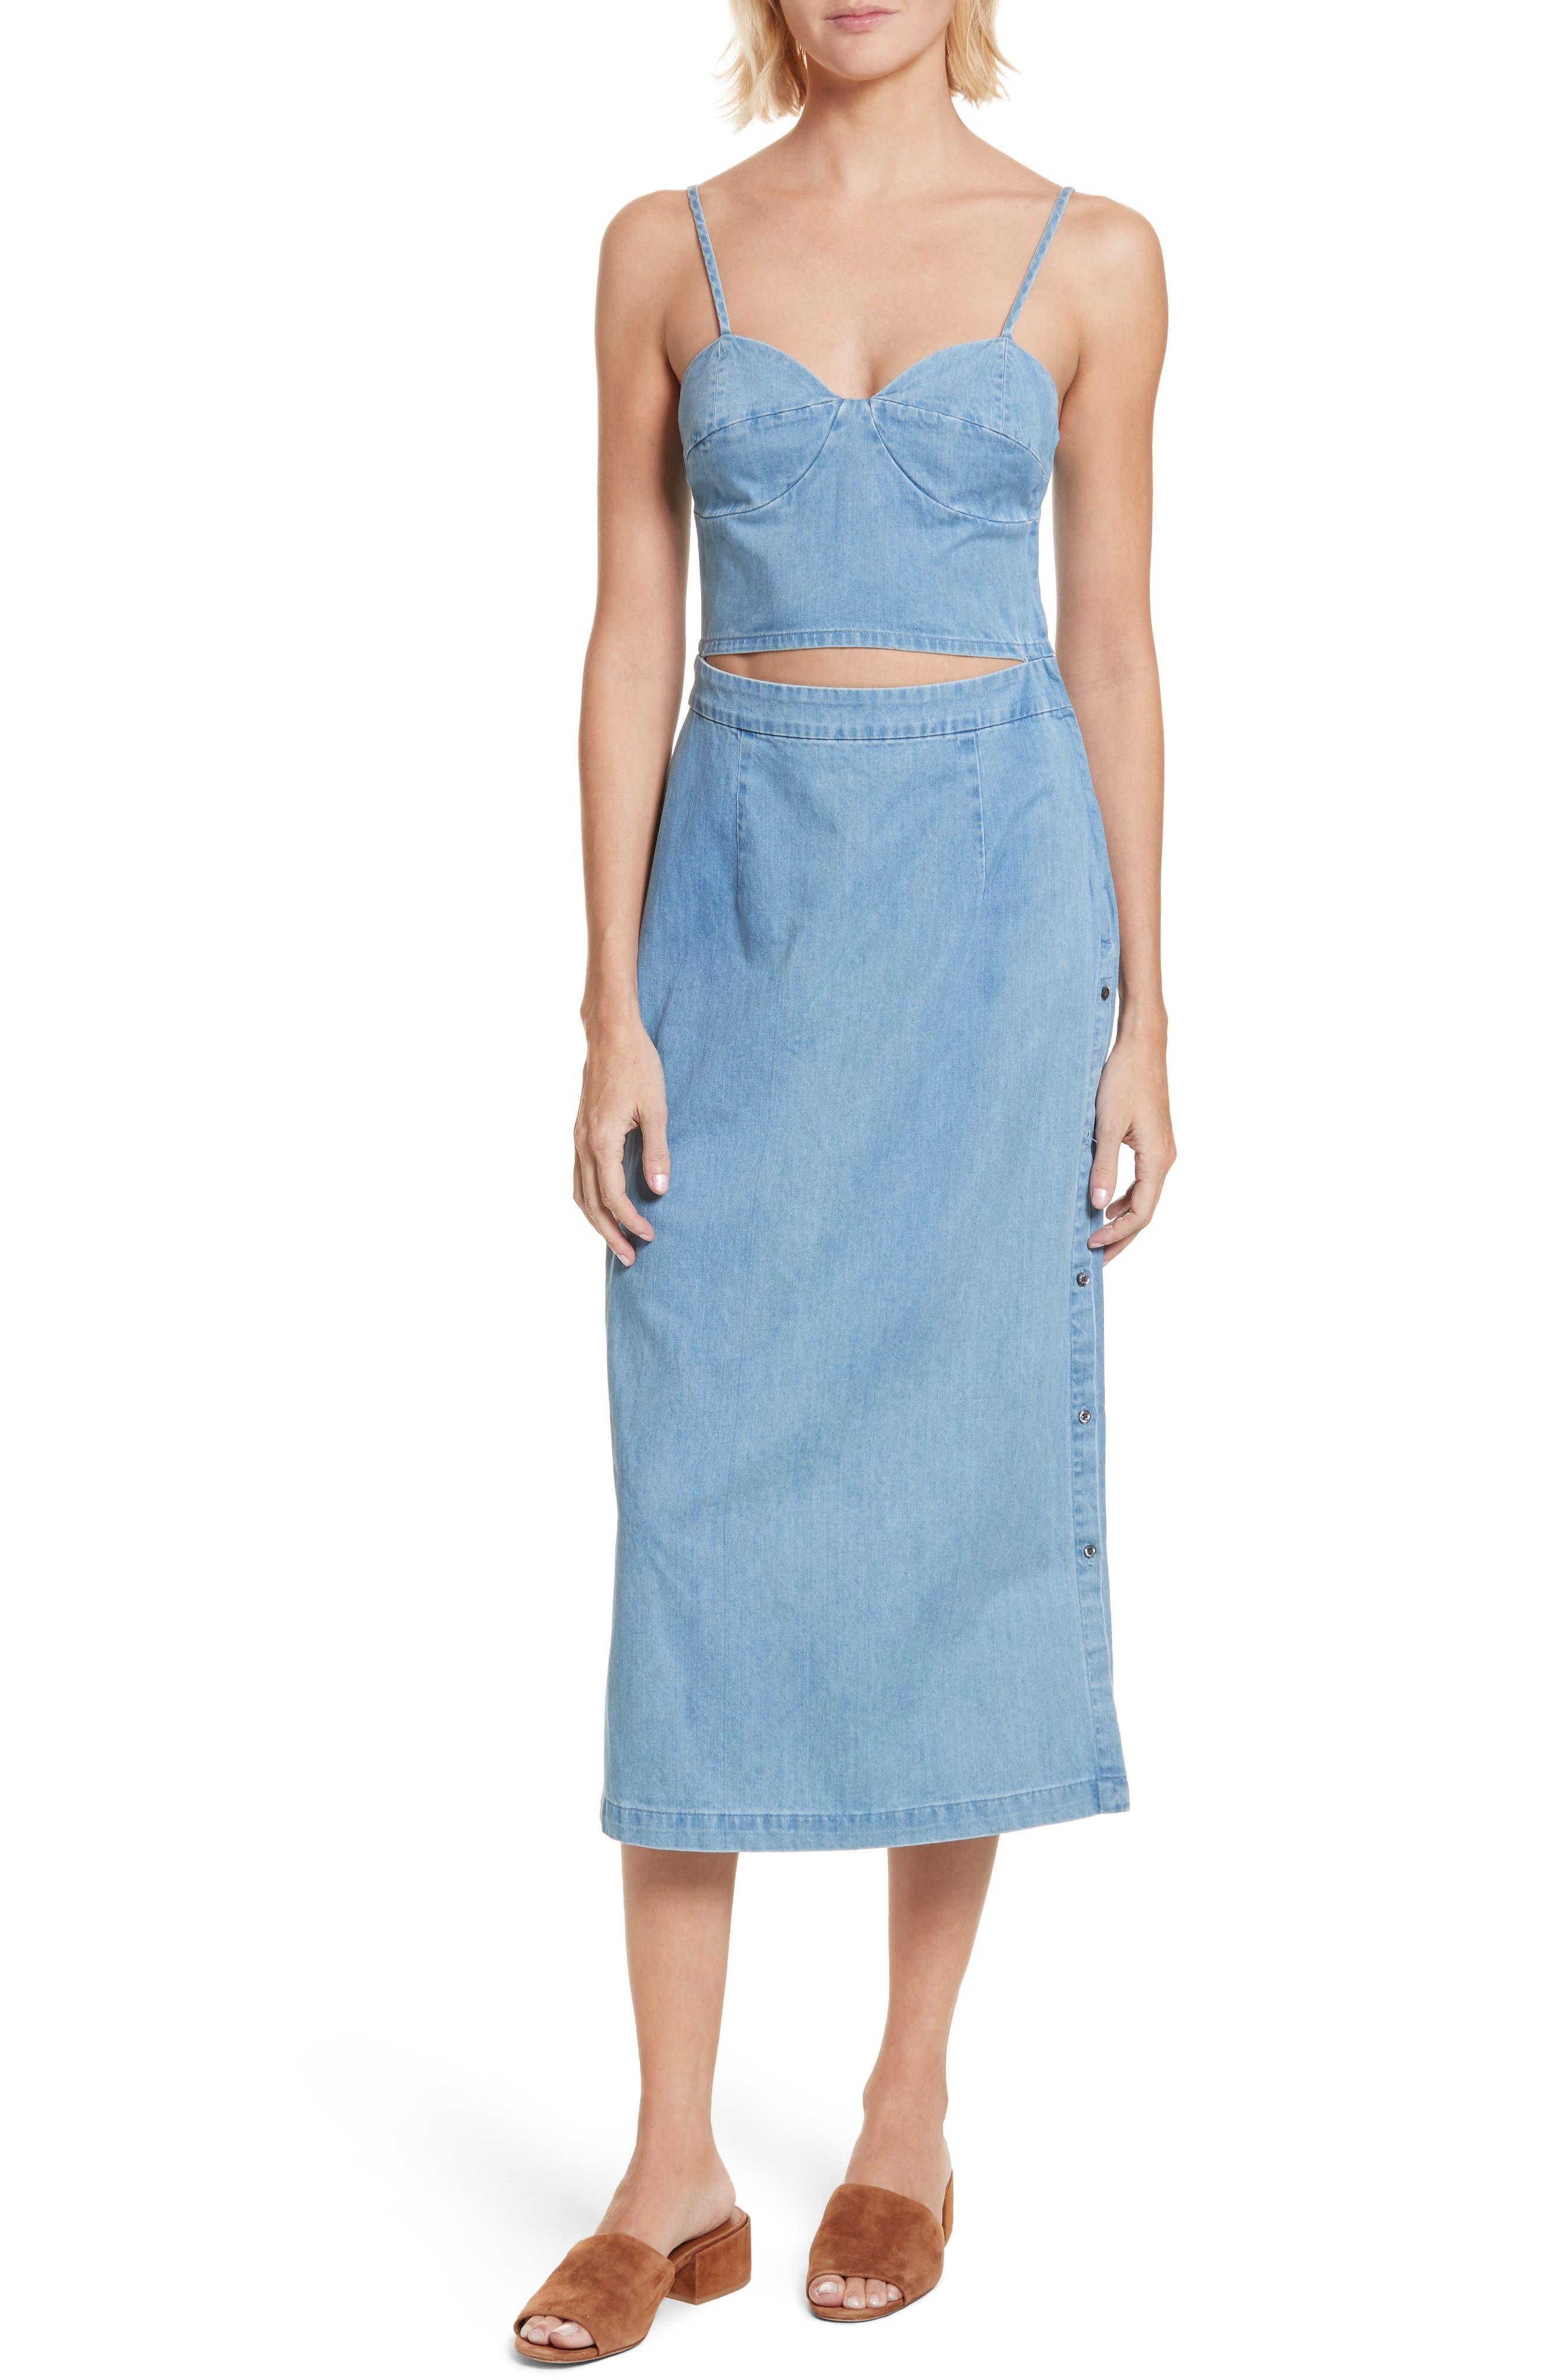 3x1 NYC Peekaboo Chambray Midi Dress